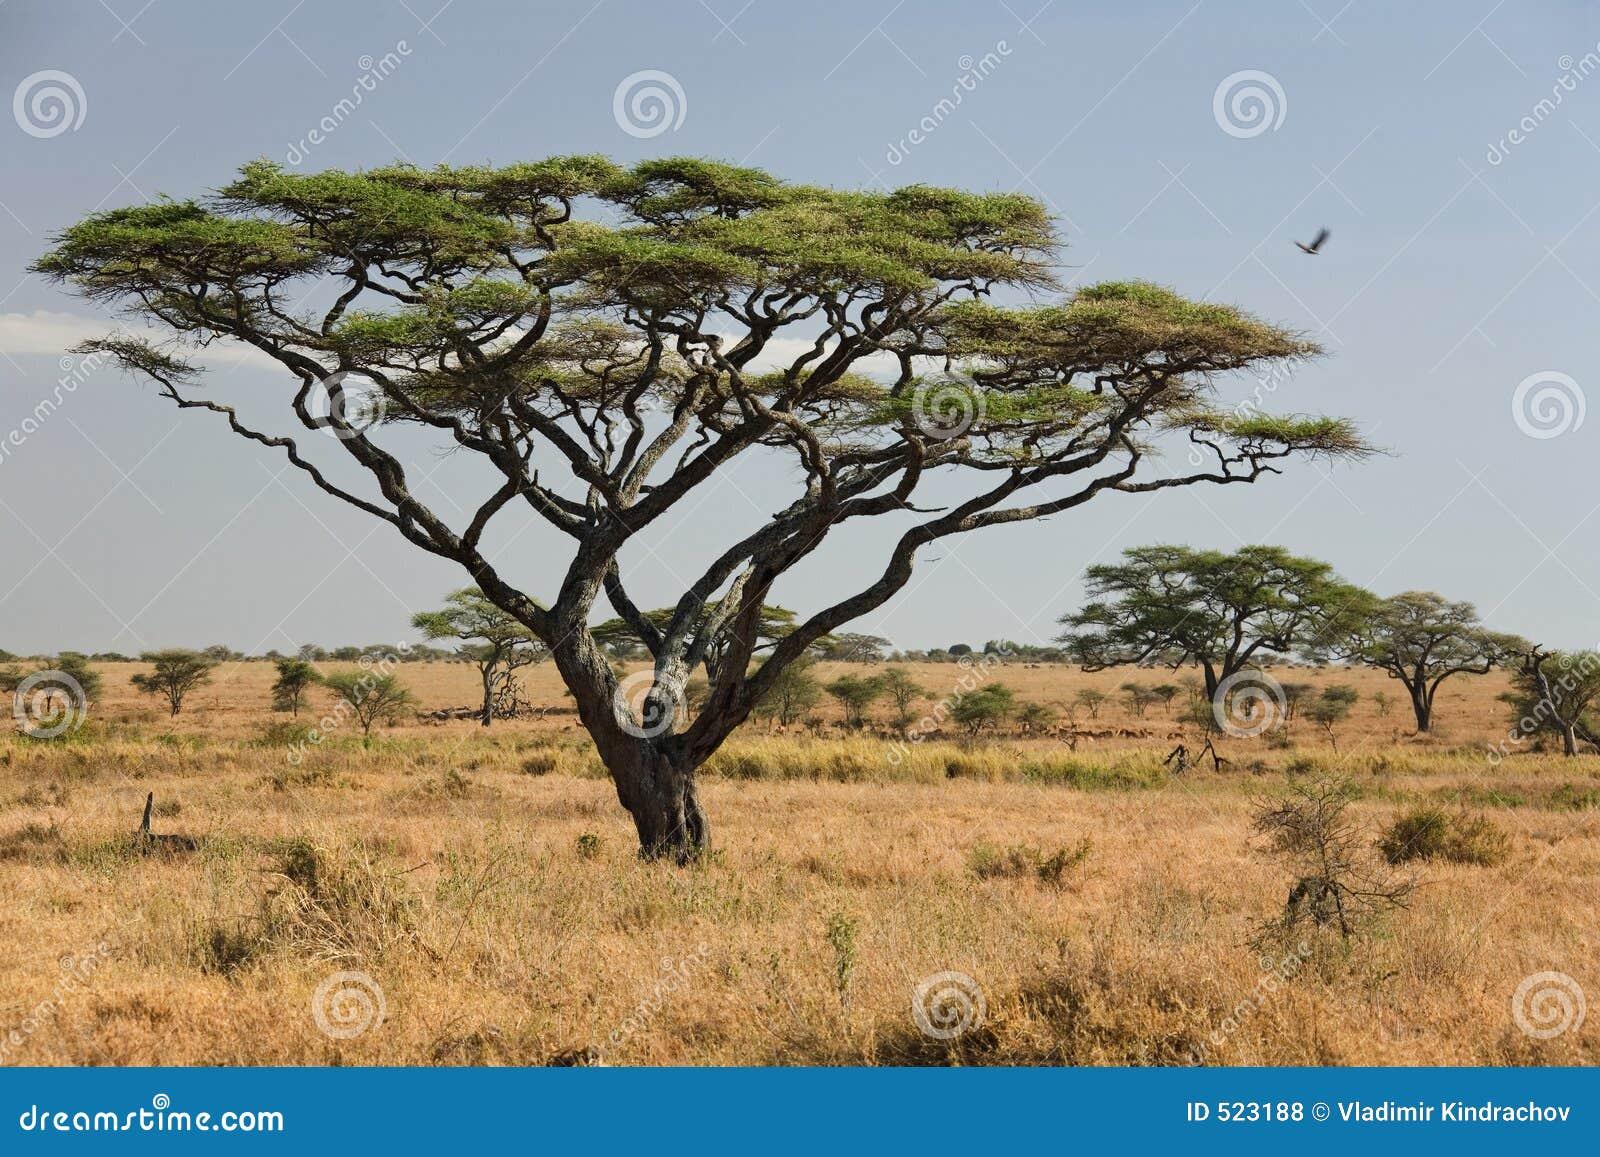 Africa landscape 027 serengeti stock photo image 523188 - Arbre africain en 7 lettres ...